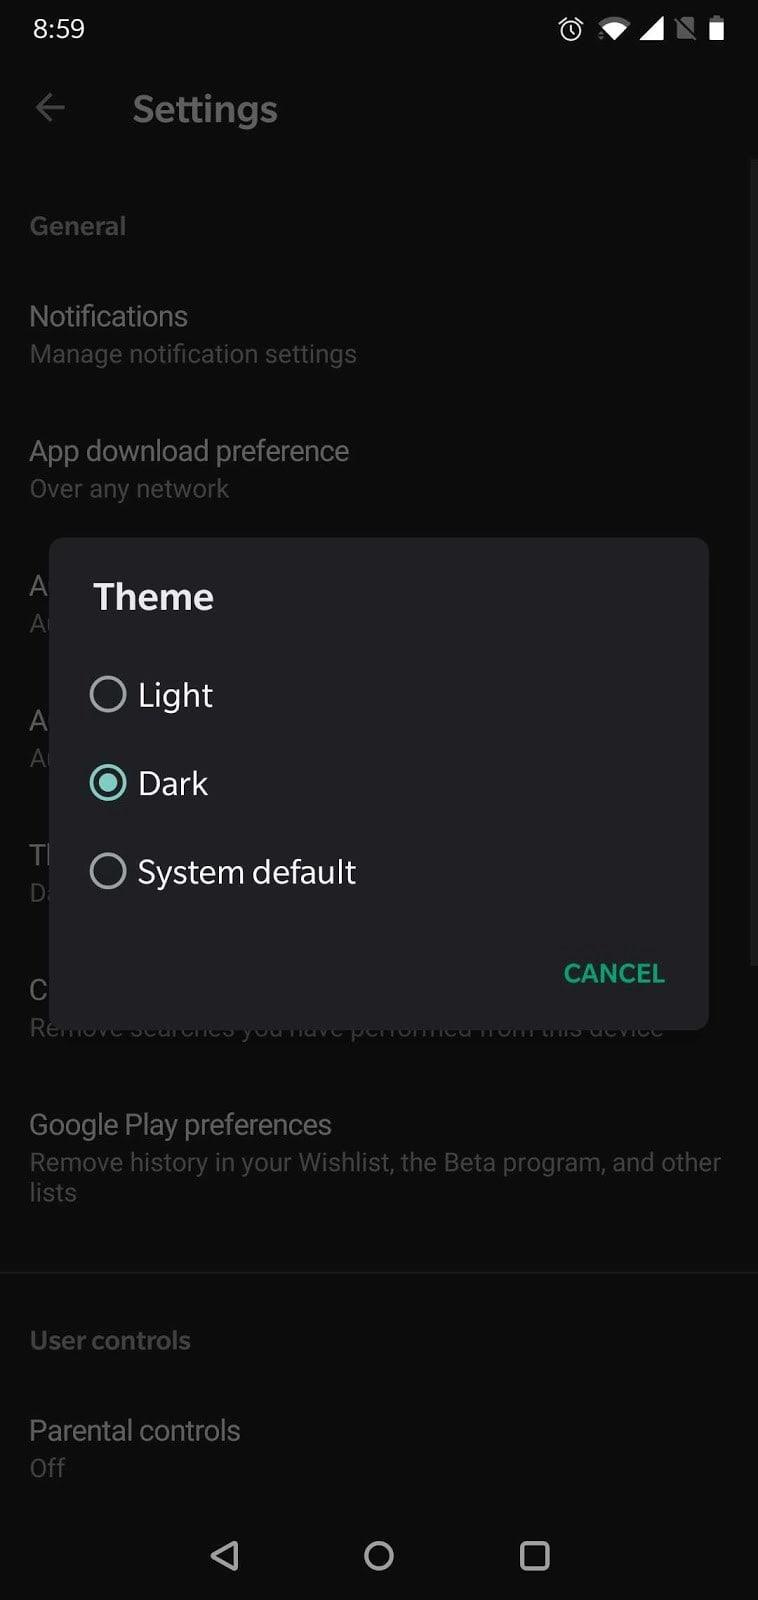 google play settings dark mode theme